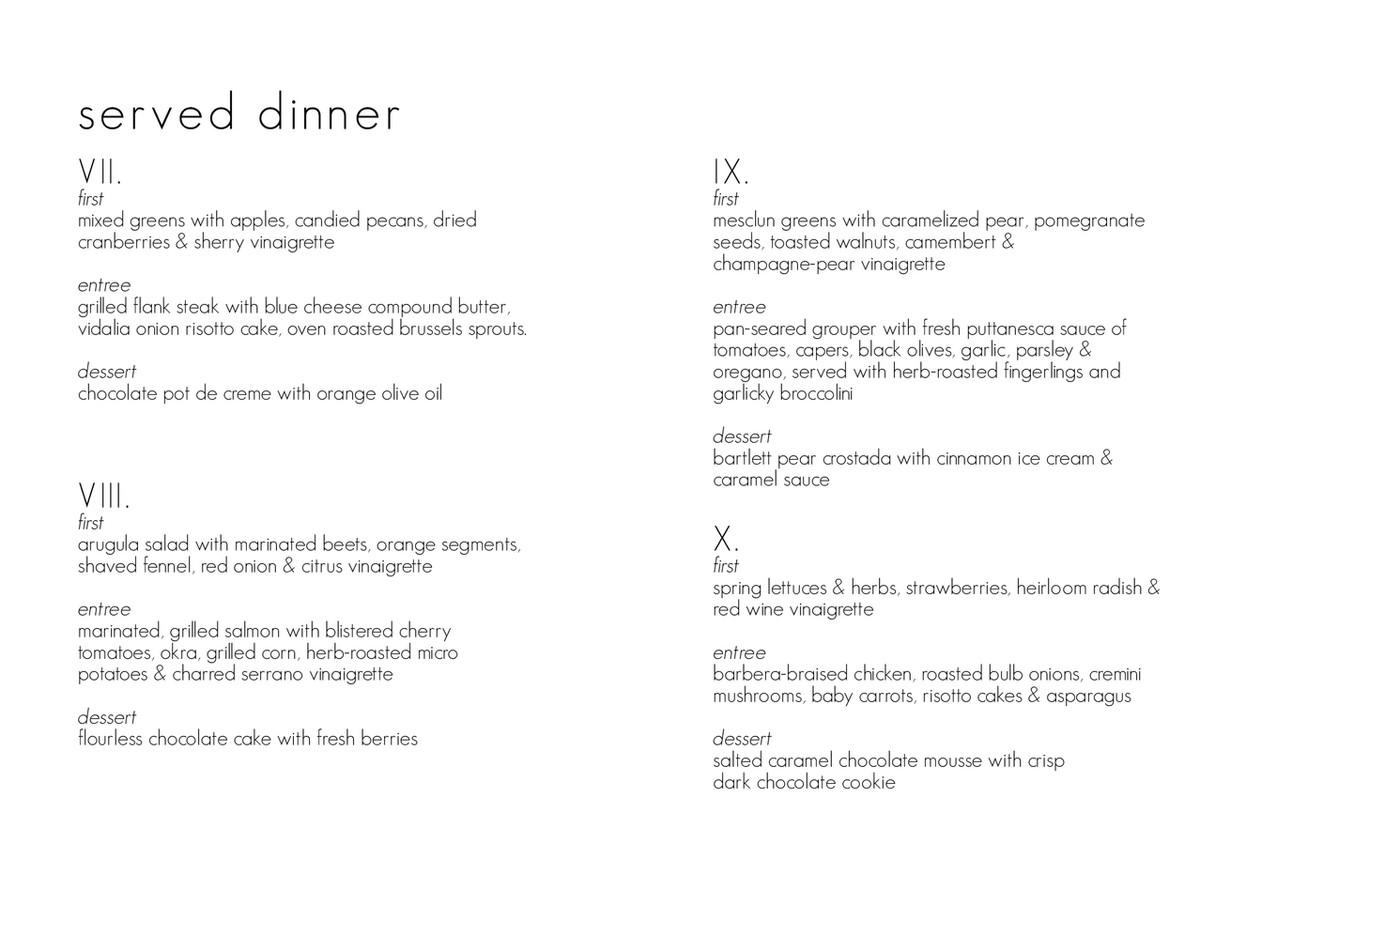 served dinner menus